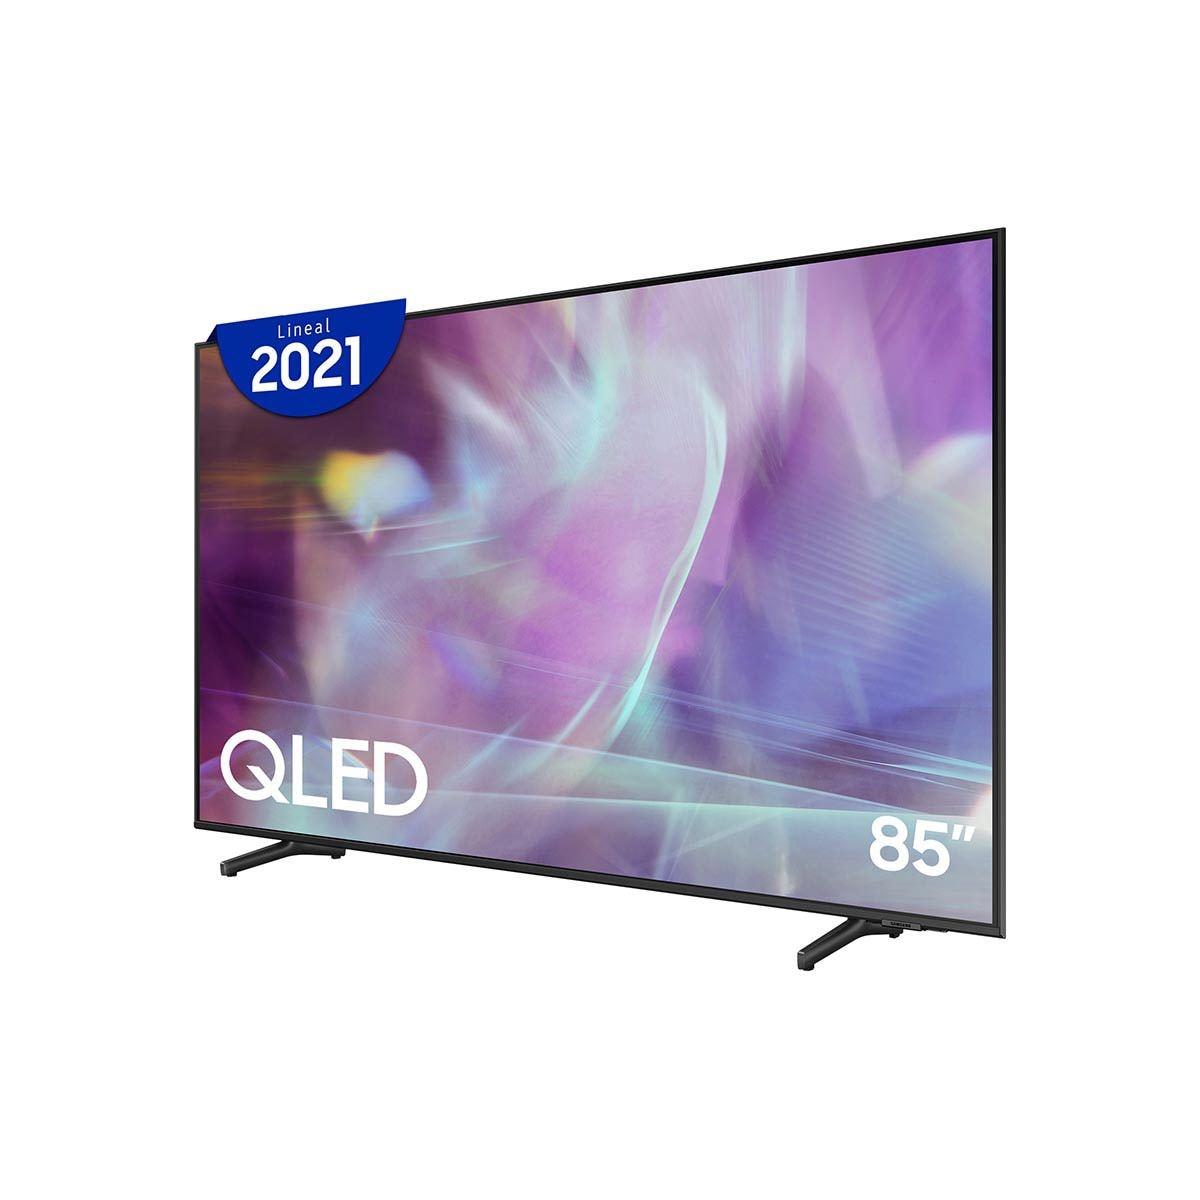 Paquete Smart TV QLED Samsung 85